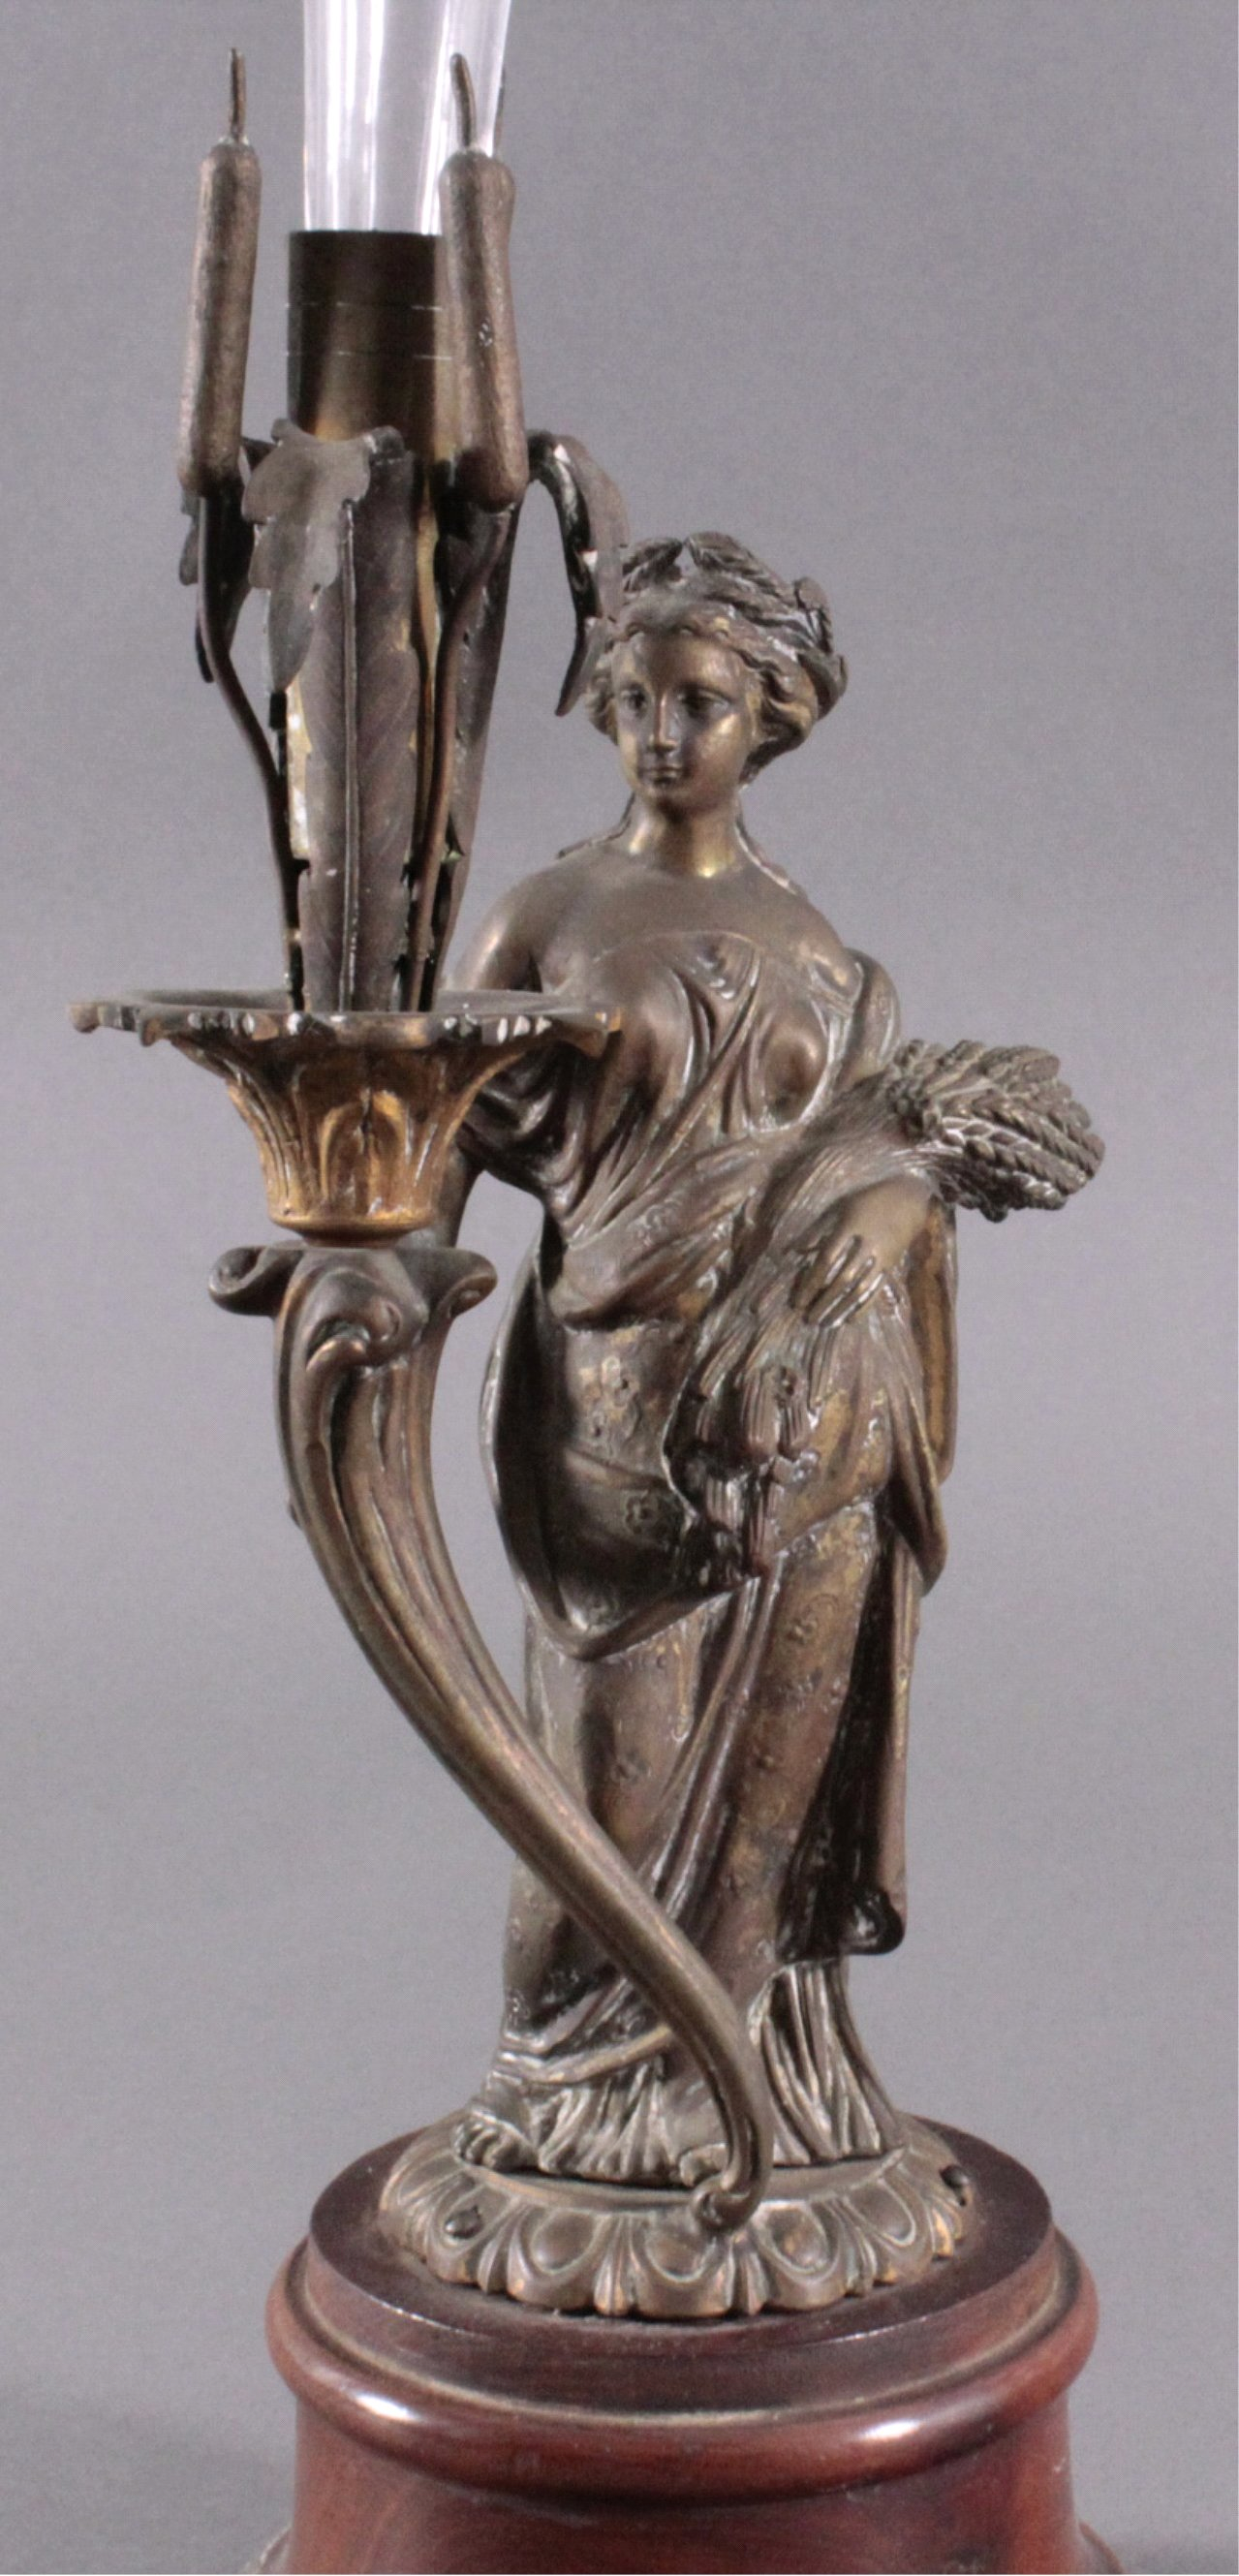 Bronze-Skulptur um 1900-1